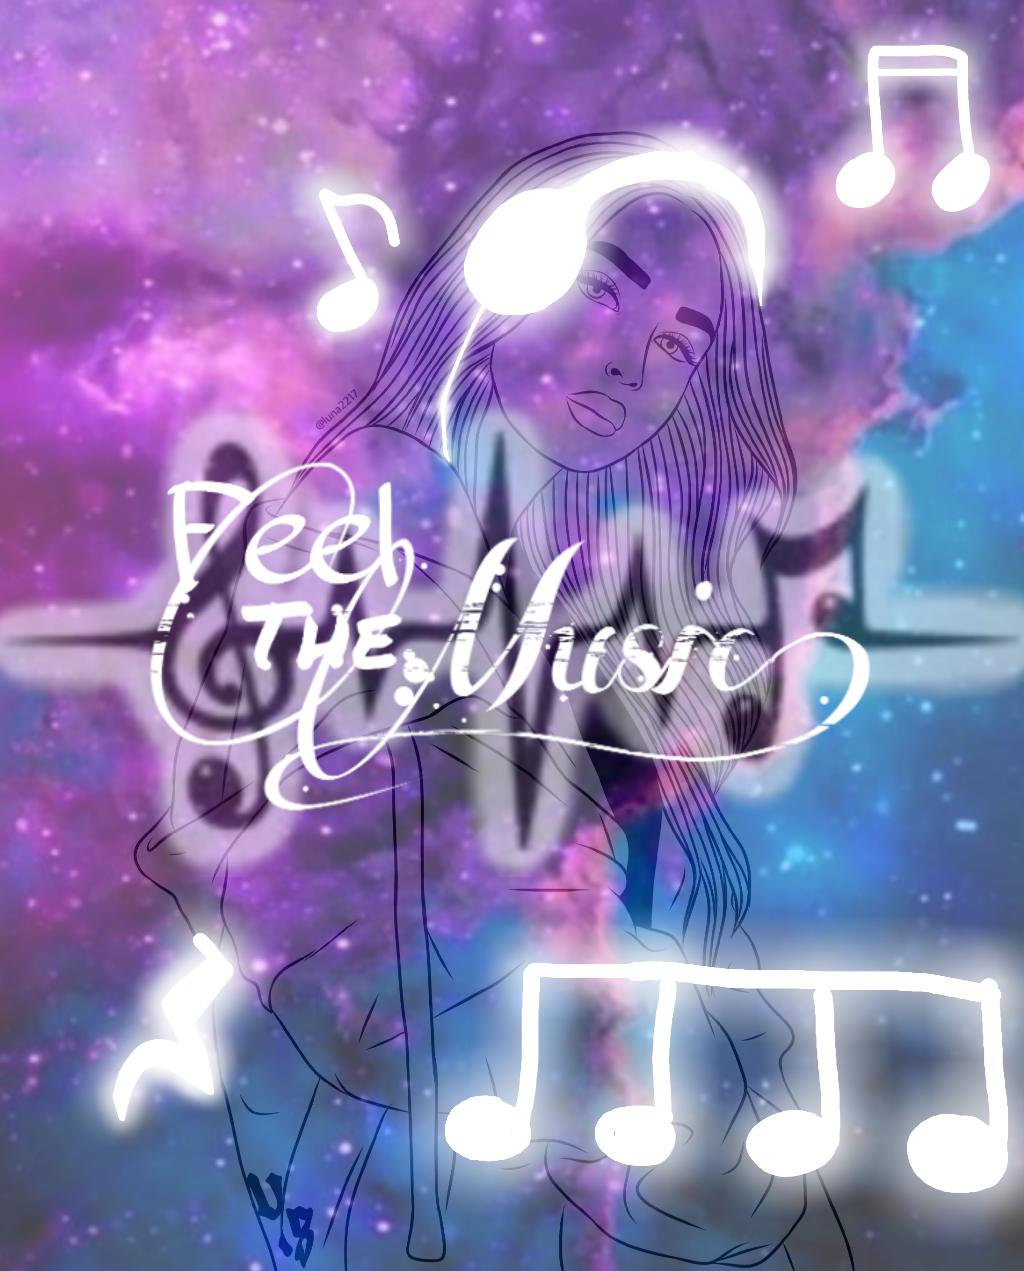 #posechallenge #feelthemusic #musicnotes #hajnapics